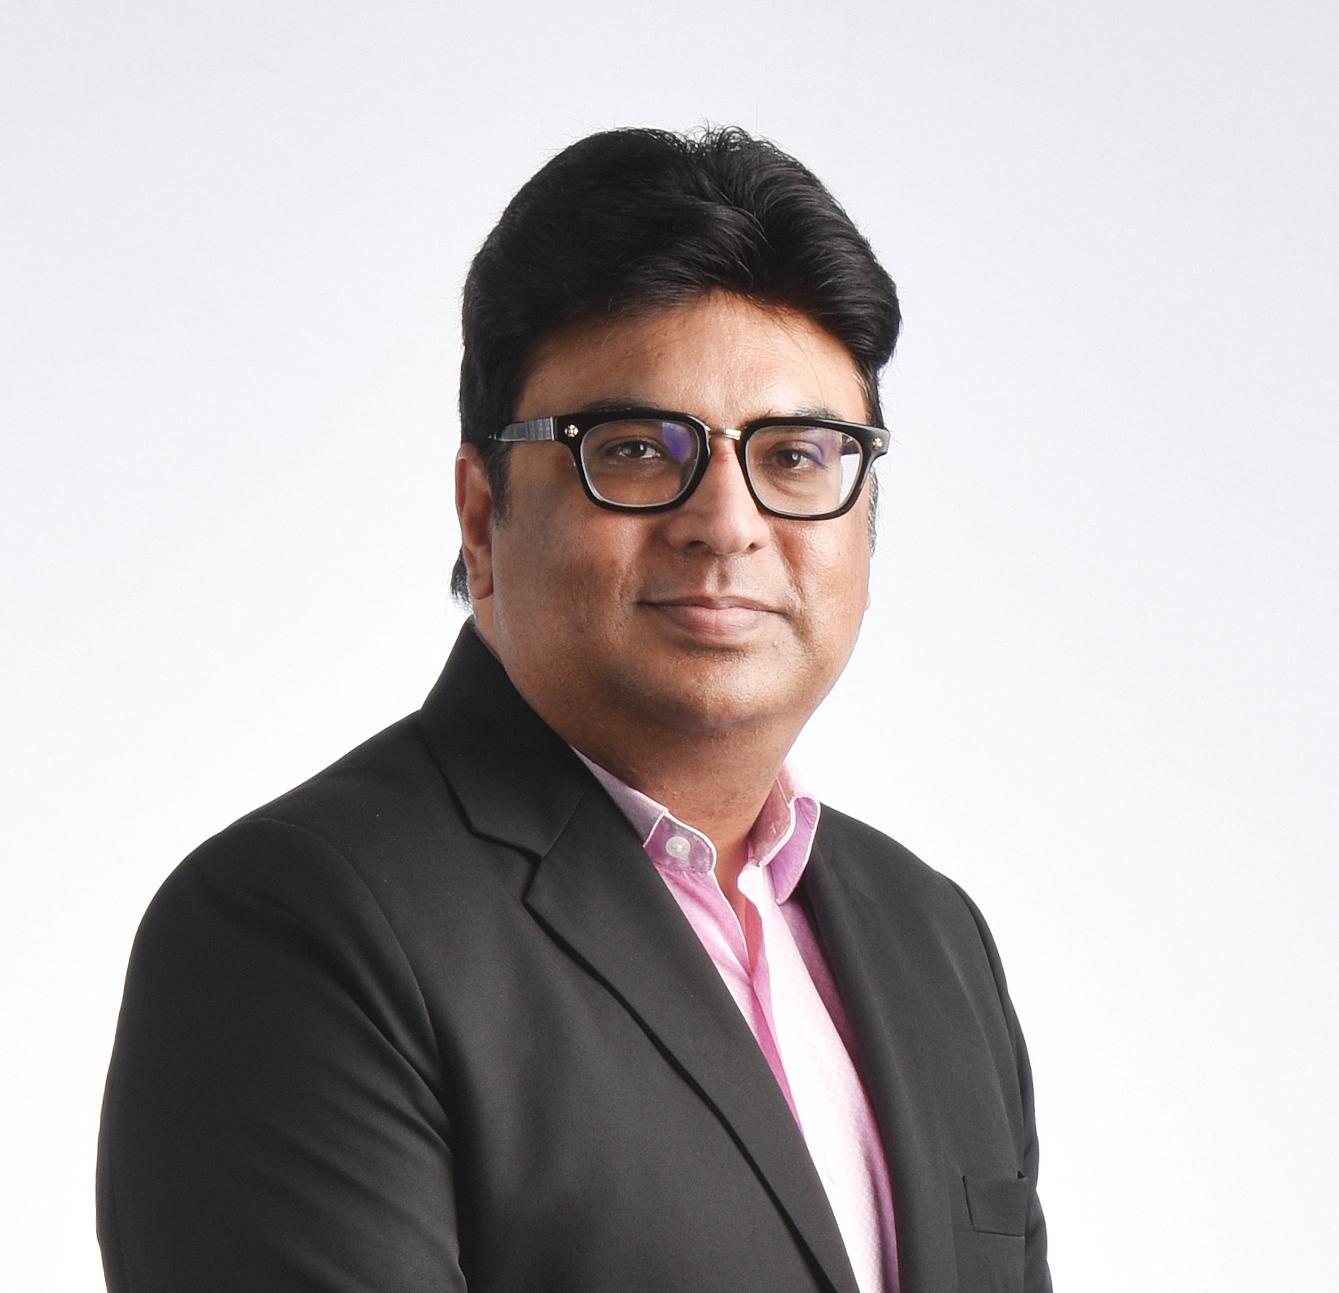 Rajan Bhalla